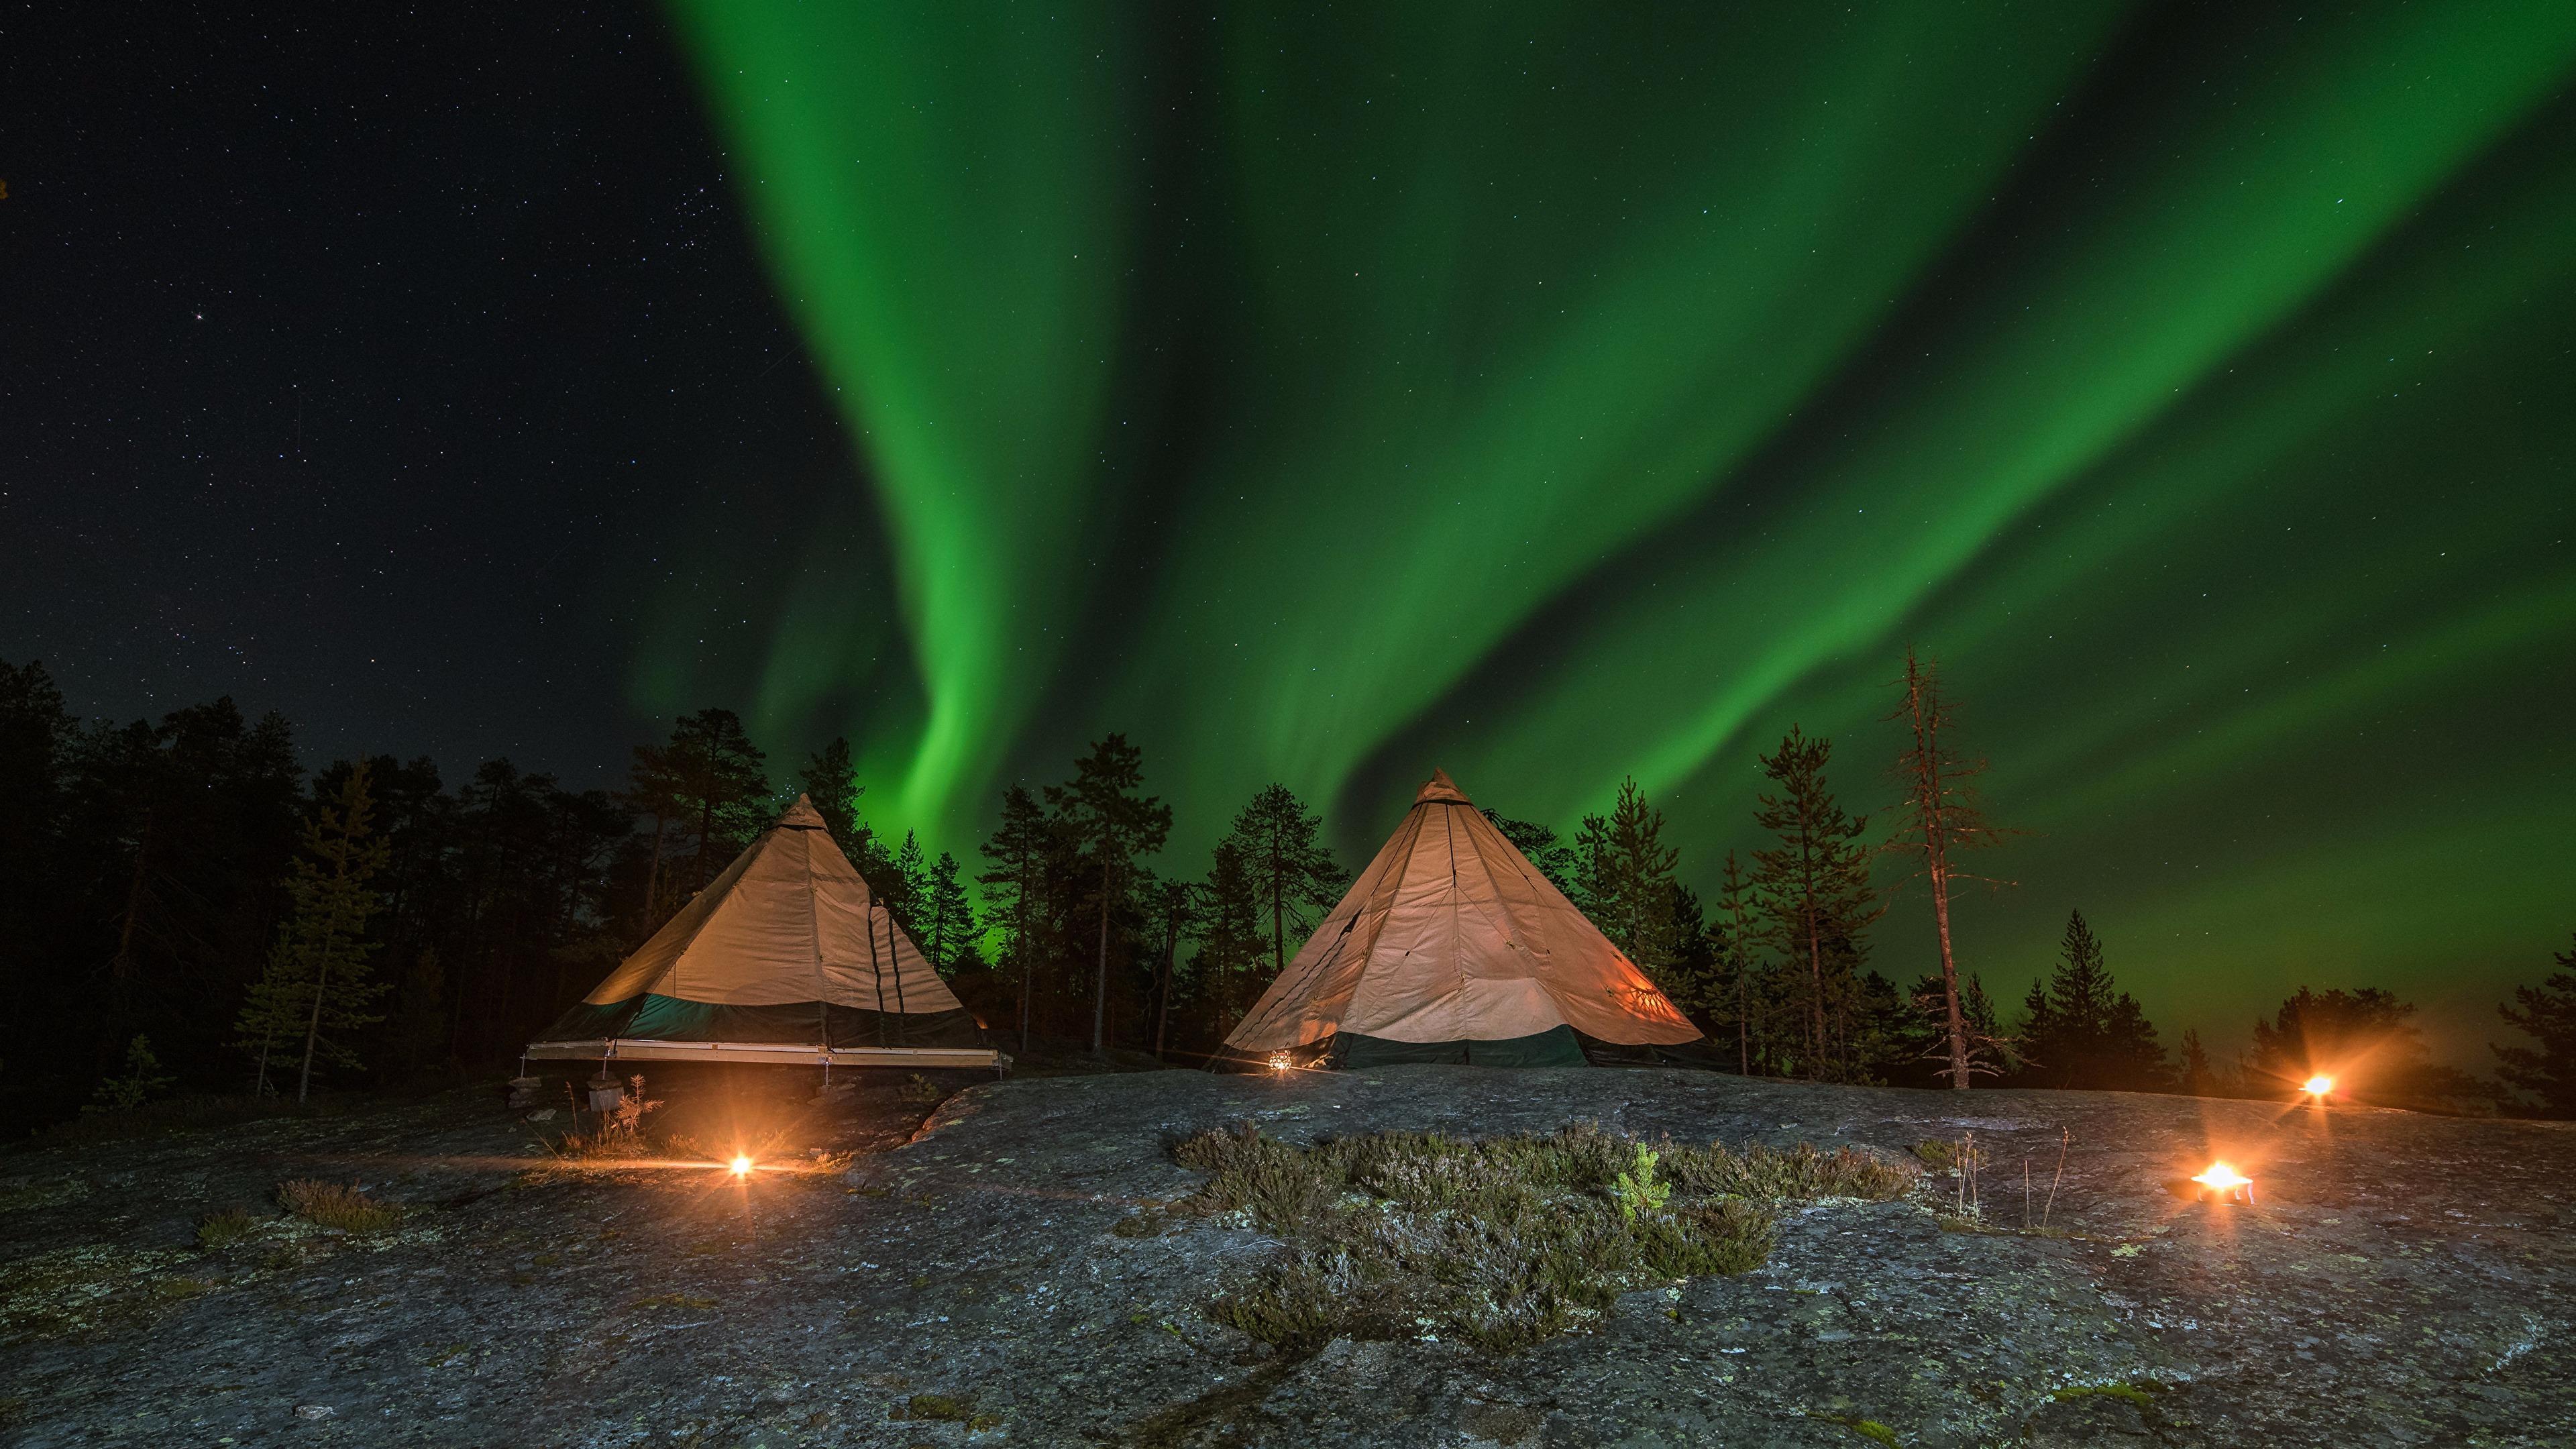 Green Northern Lights in Lapland wallpaper